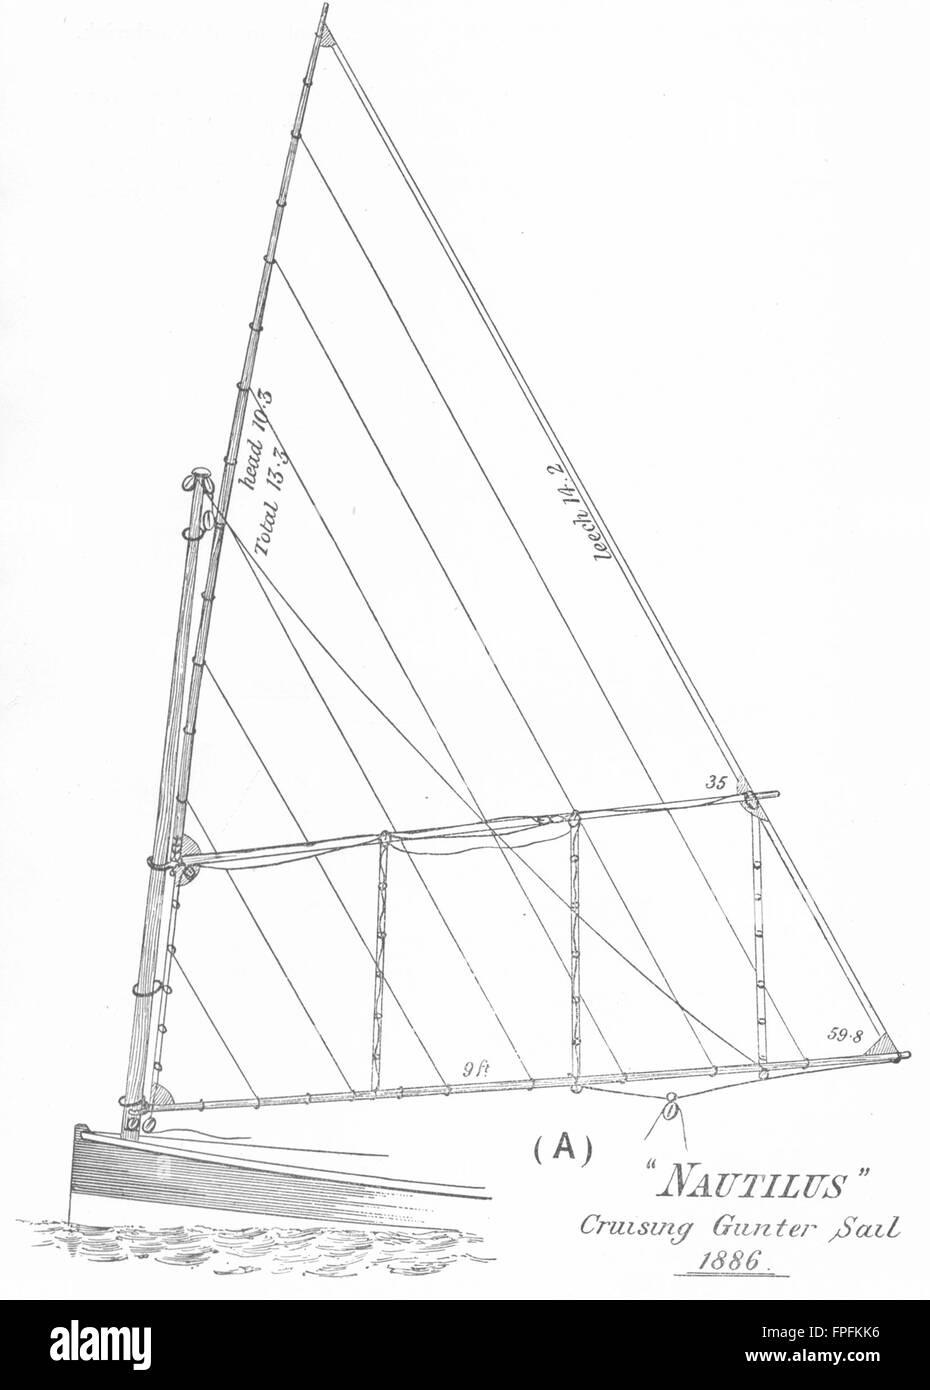 BOATS: 'Nautilus Cruising Gunter Sail, antique print 1891 - Stock Image